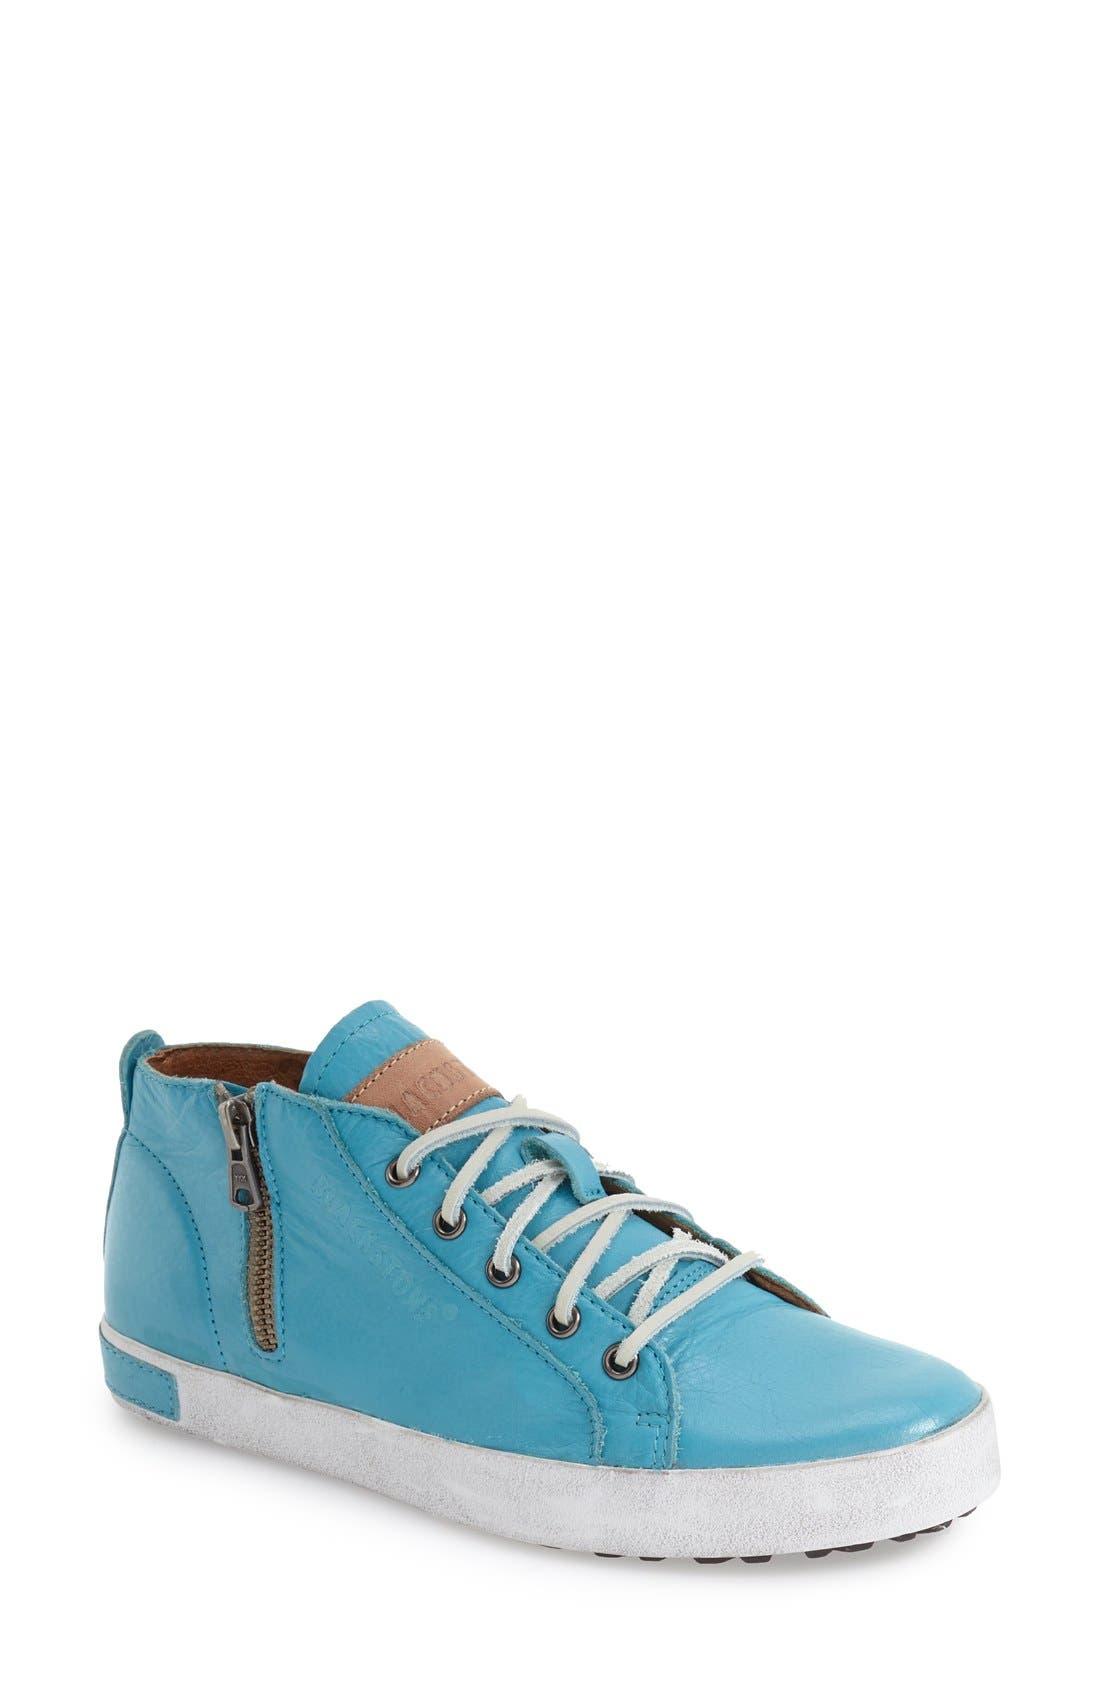 'JL24' Sneaker,                             Main thumbnail 1, color,                             Laguna Leather